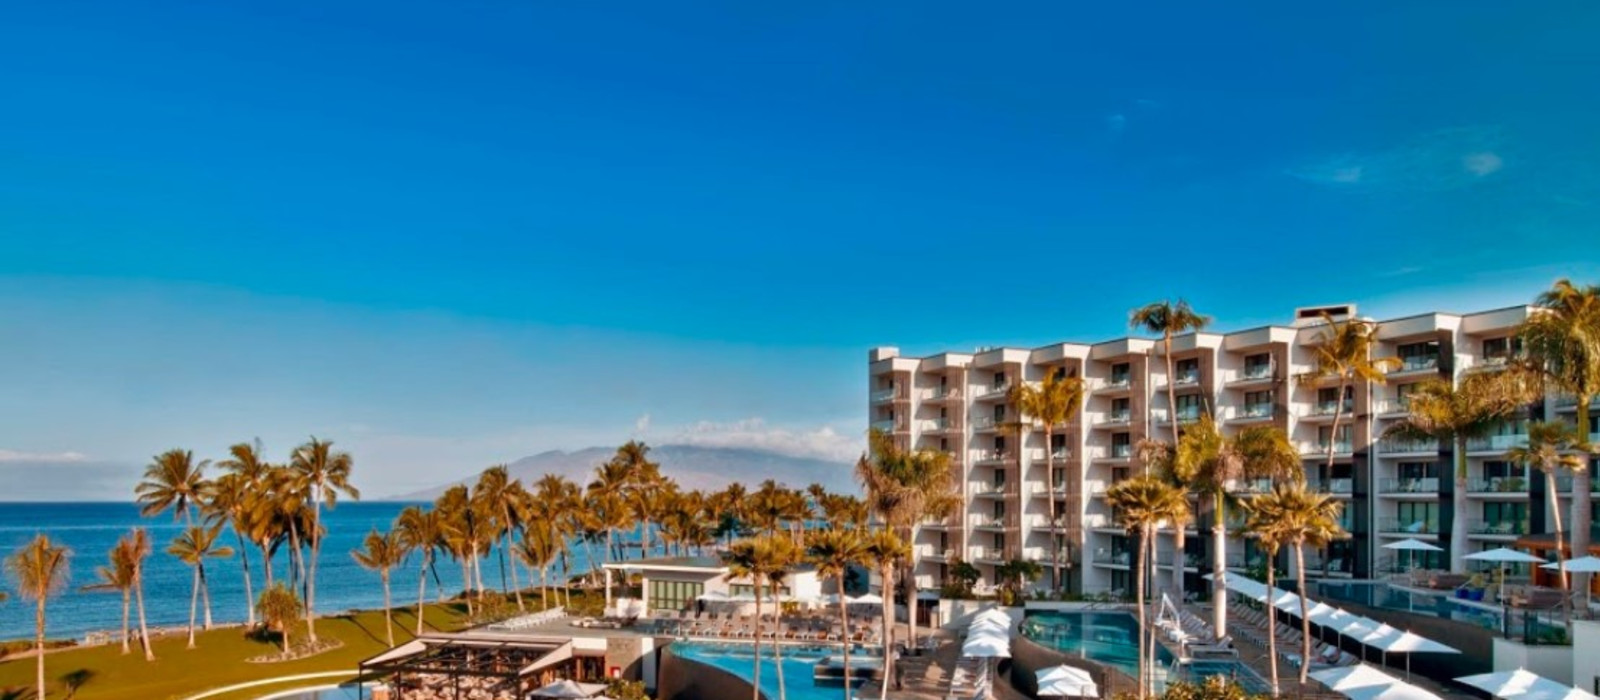 Hotel Andaz Maui at Wailea Hawaii